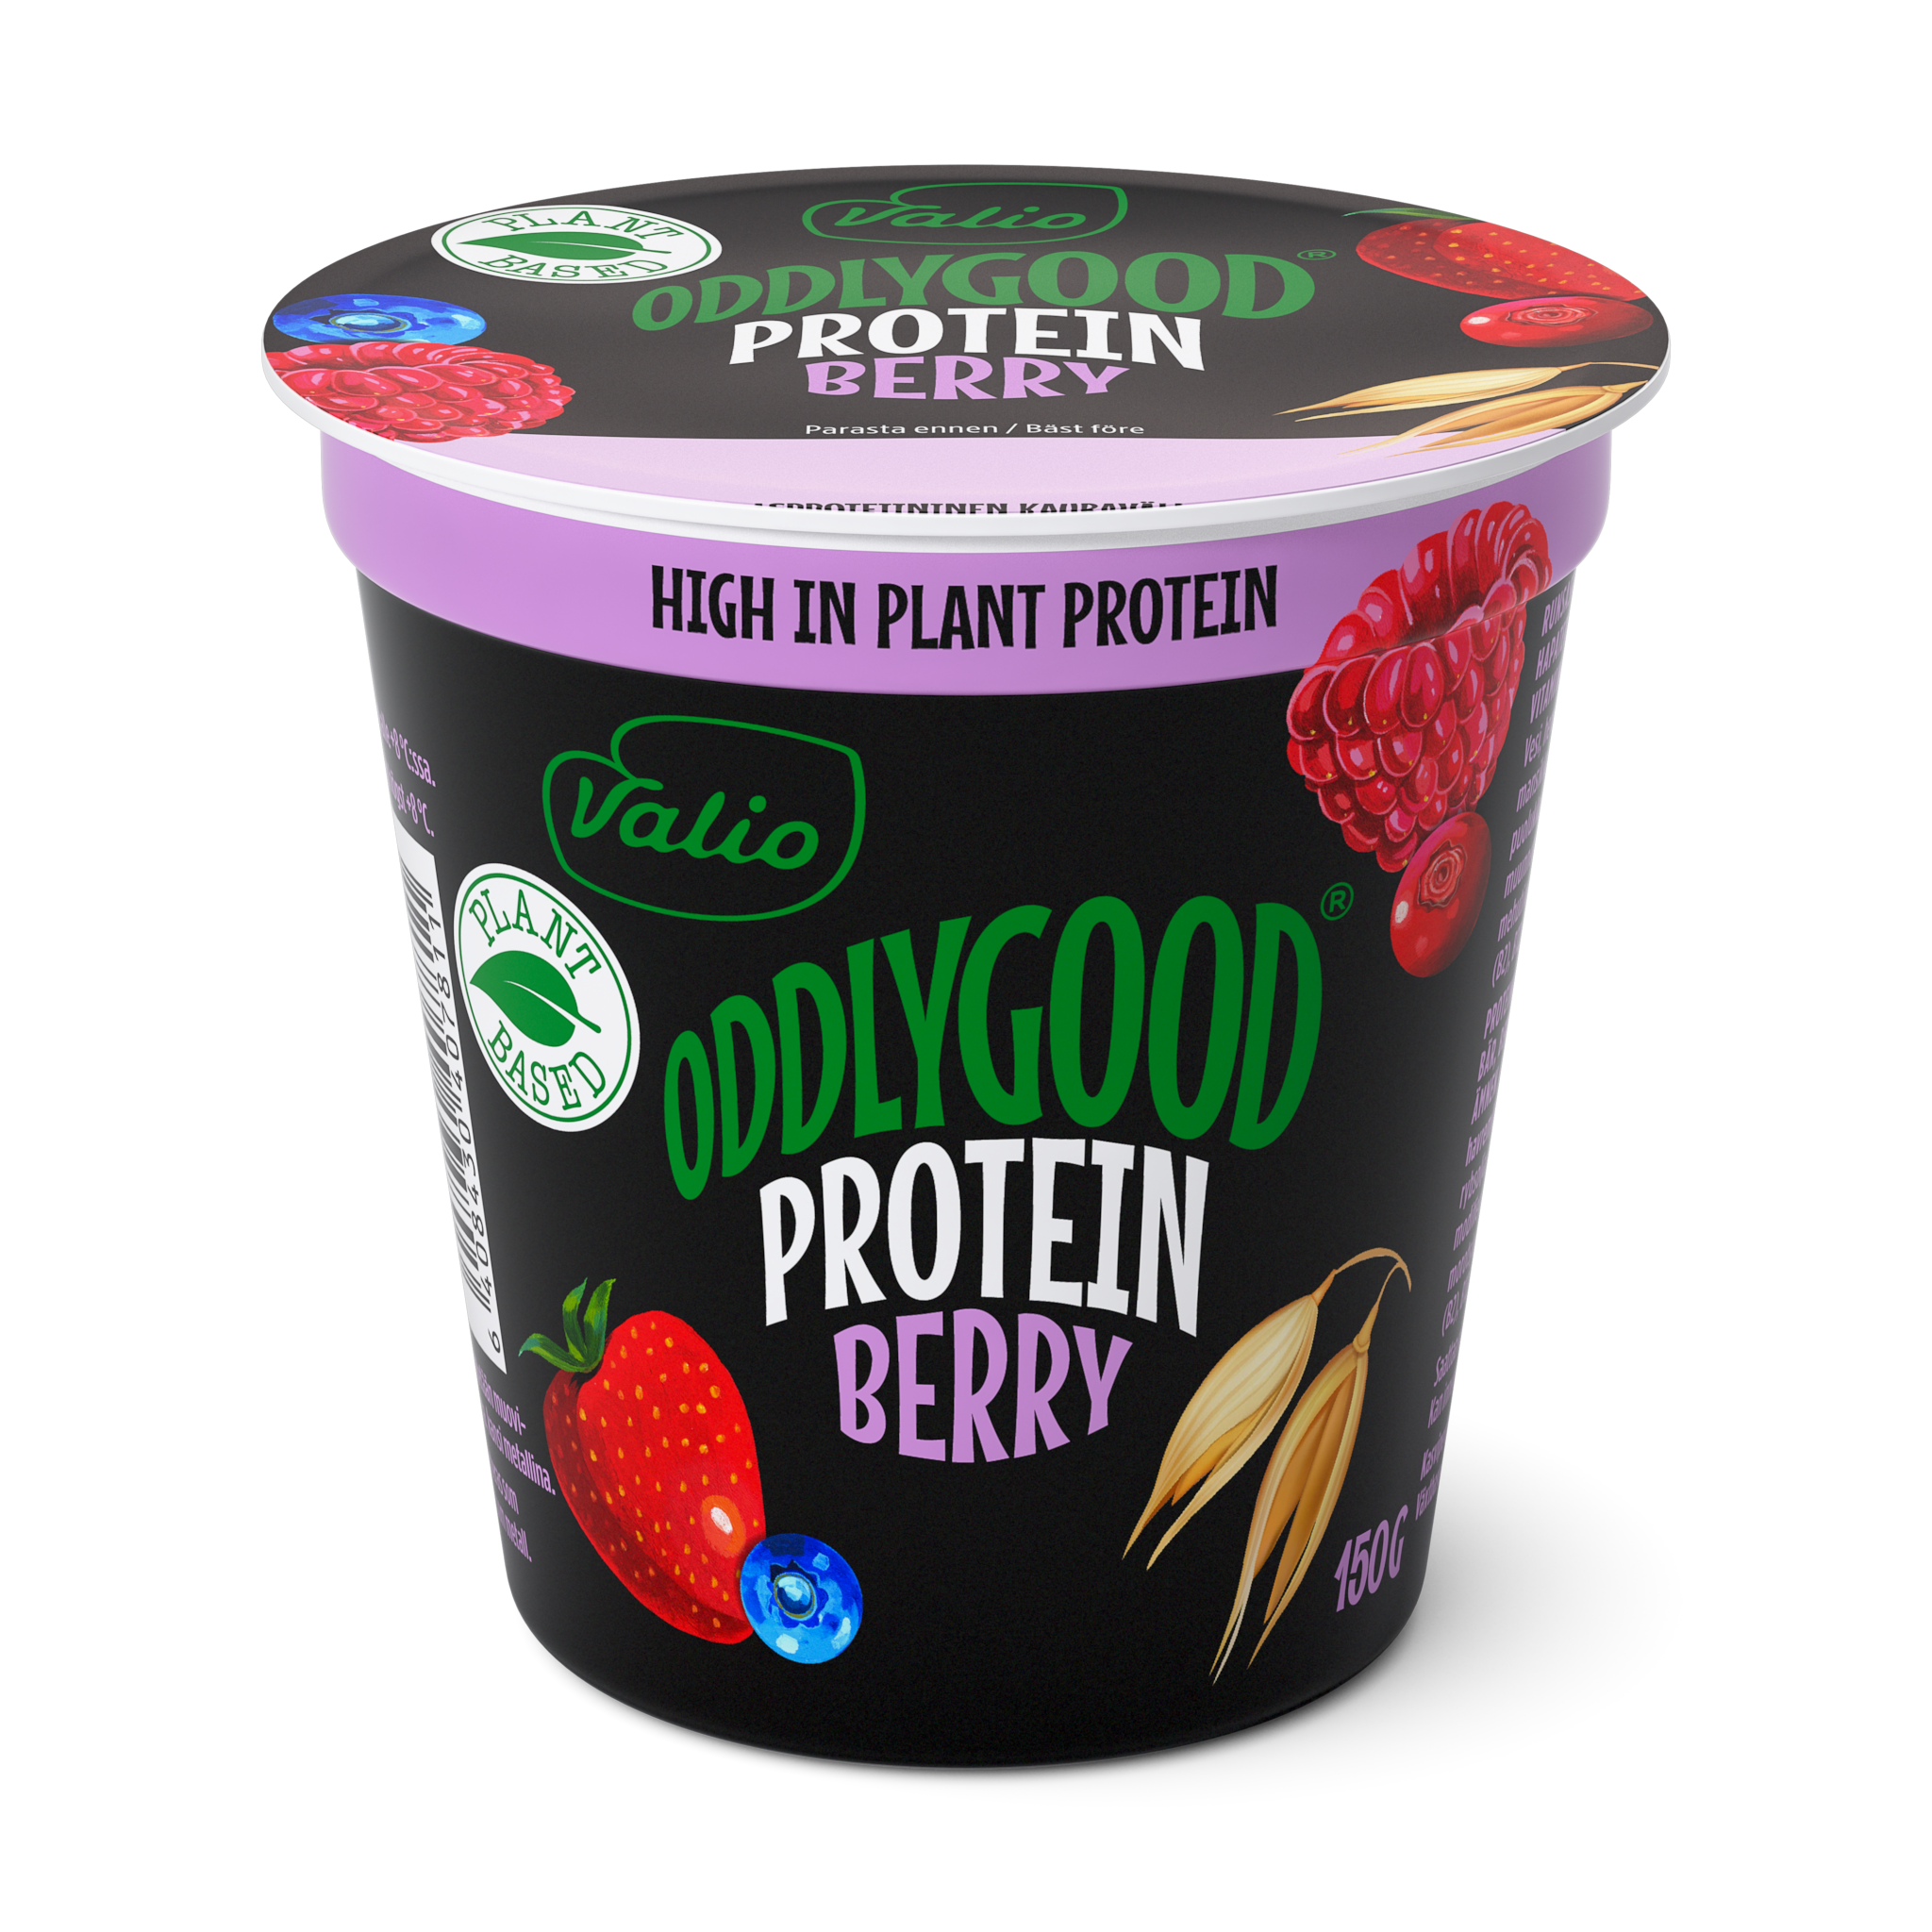 Valio Oddlygood® proteiinivälipala Berry